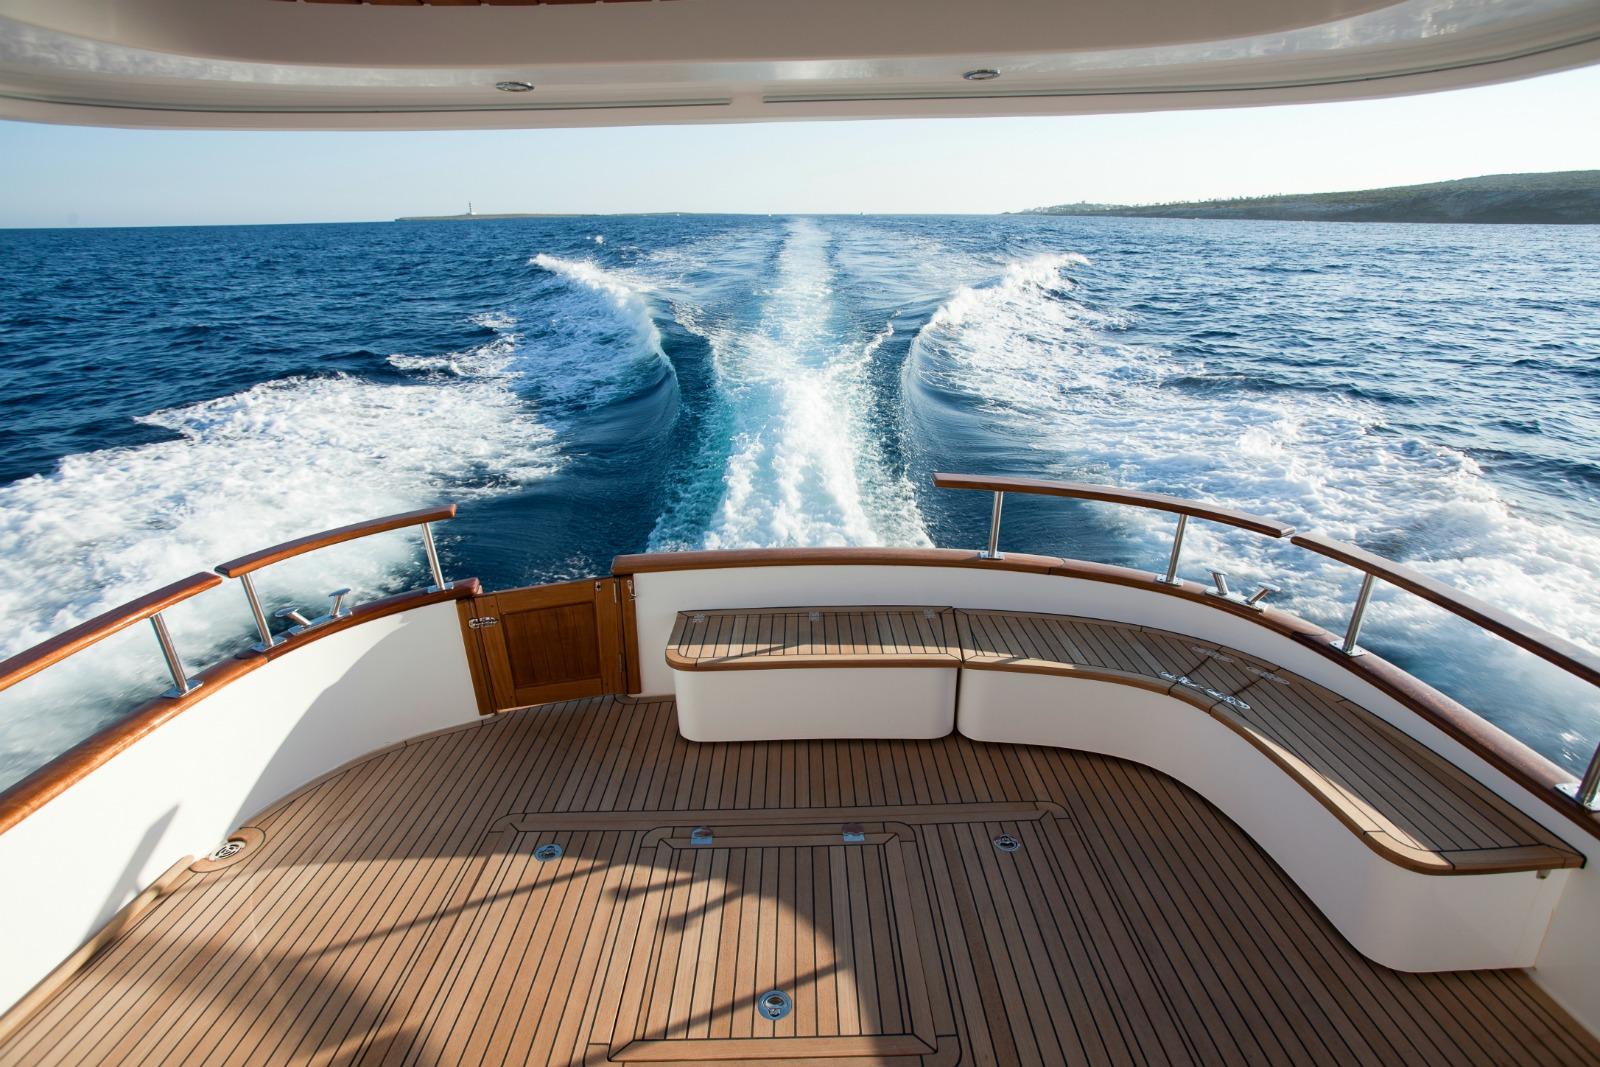 Minorca Yachts Islander 42 yacht for sale